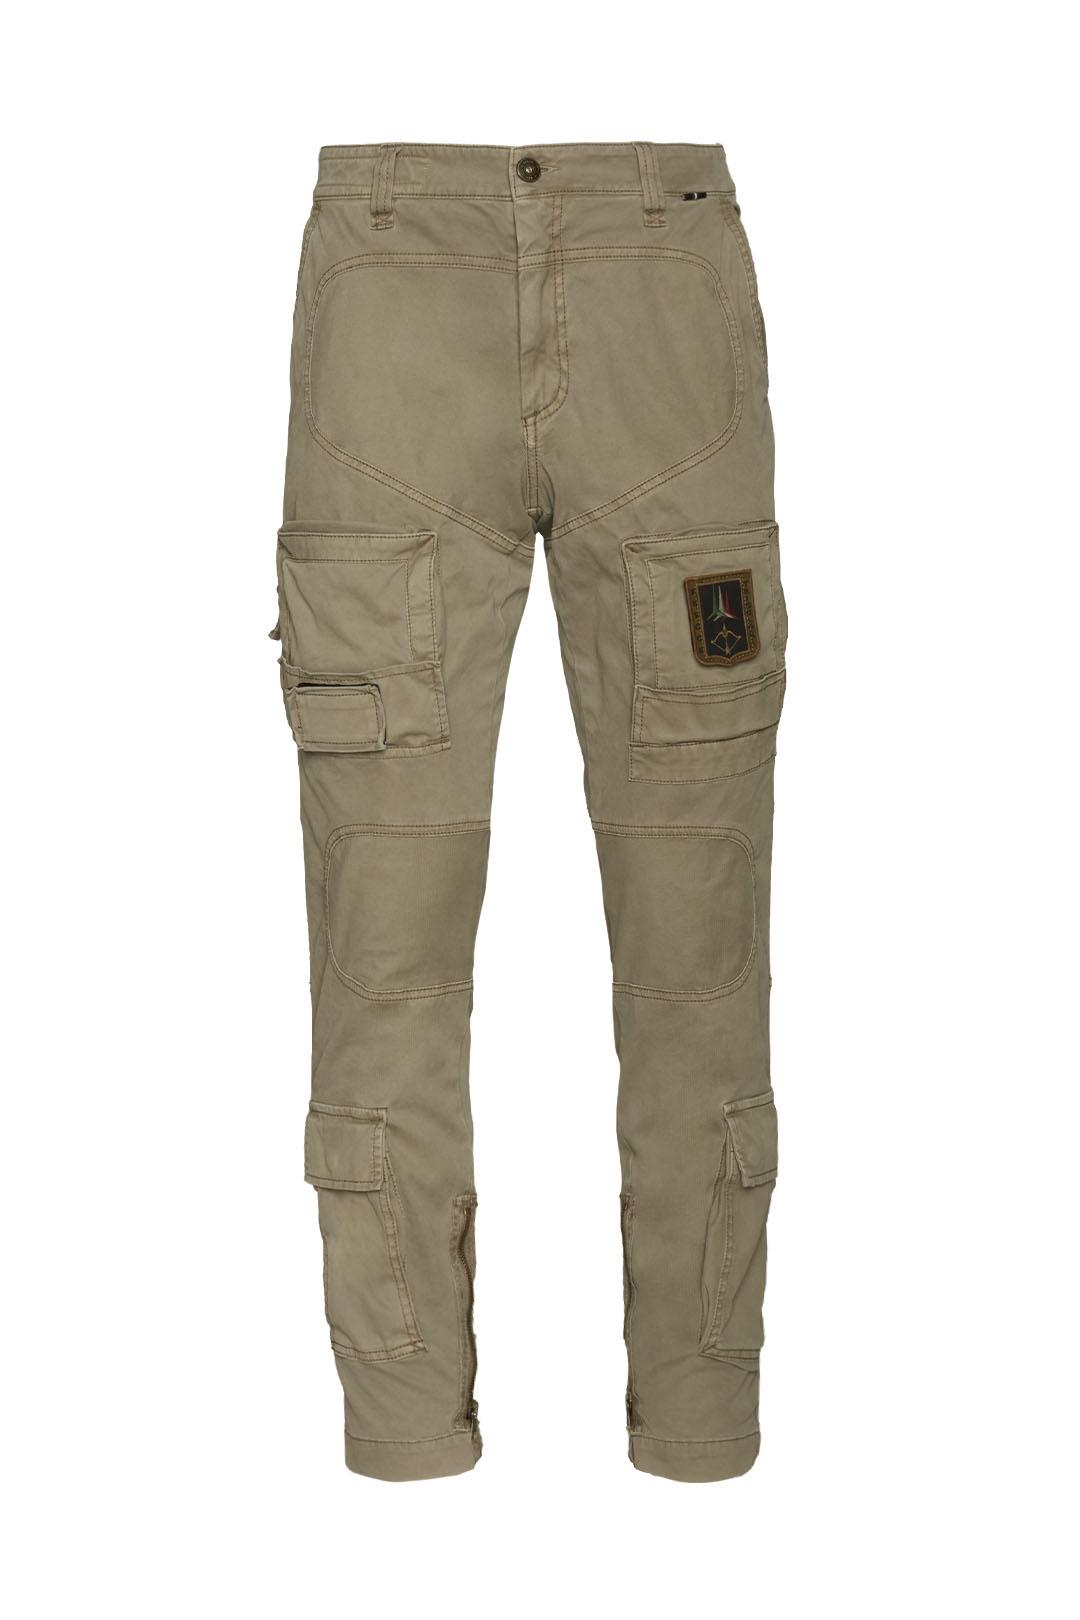 Iconic gabardine Anti-G trousers